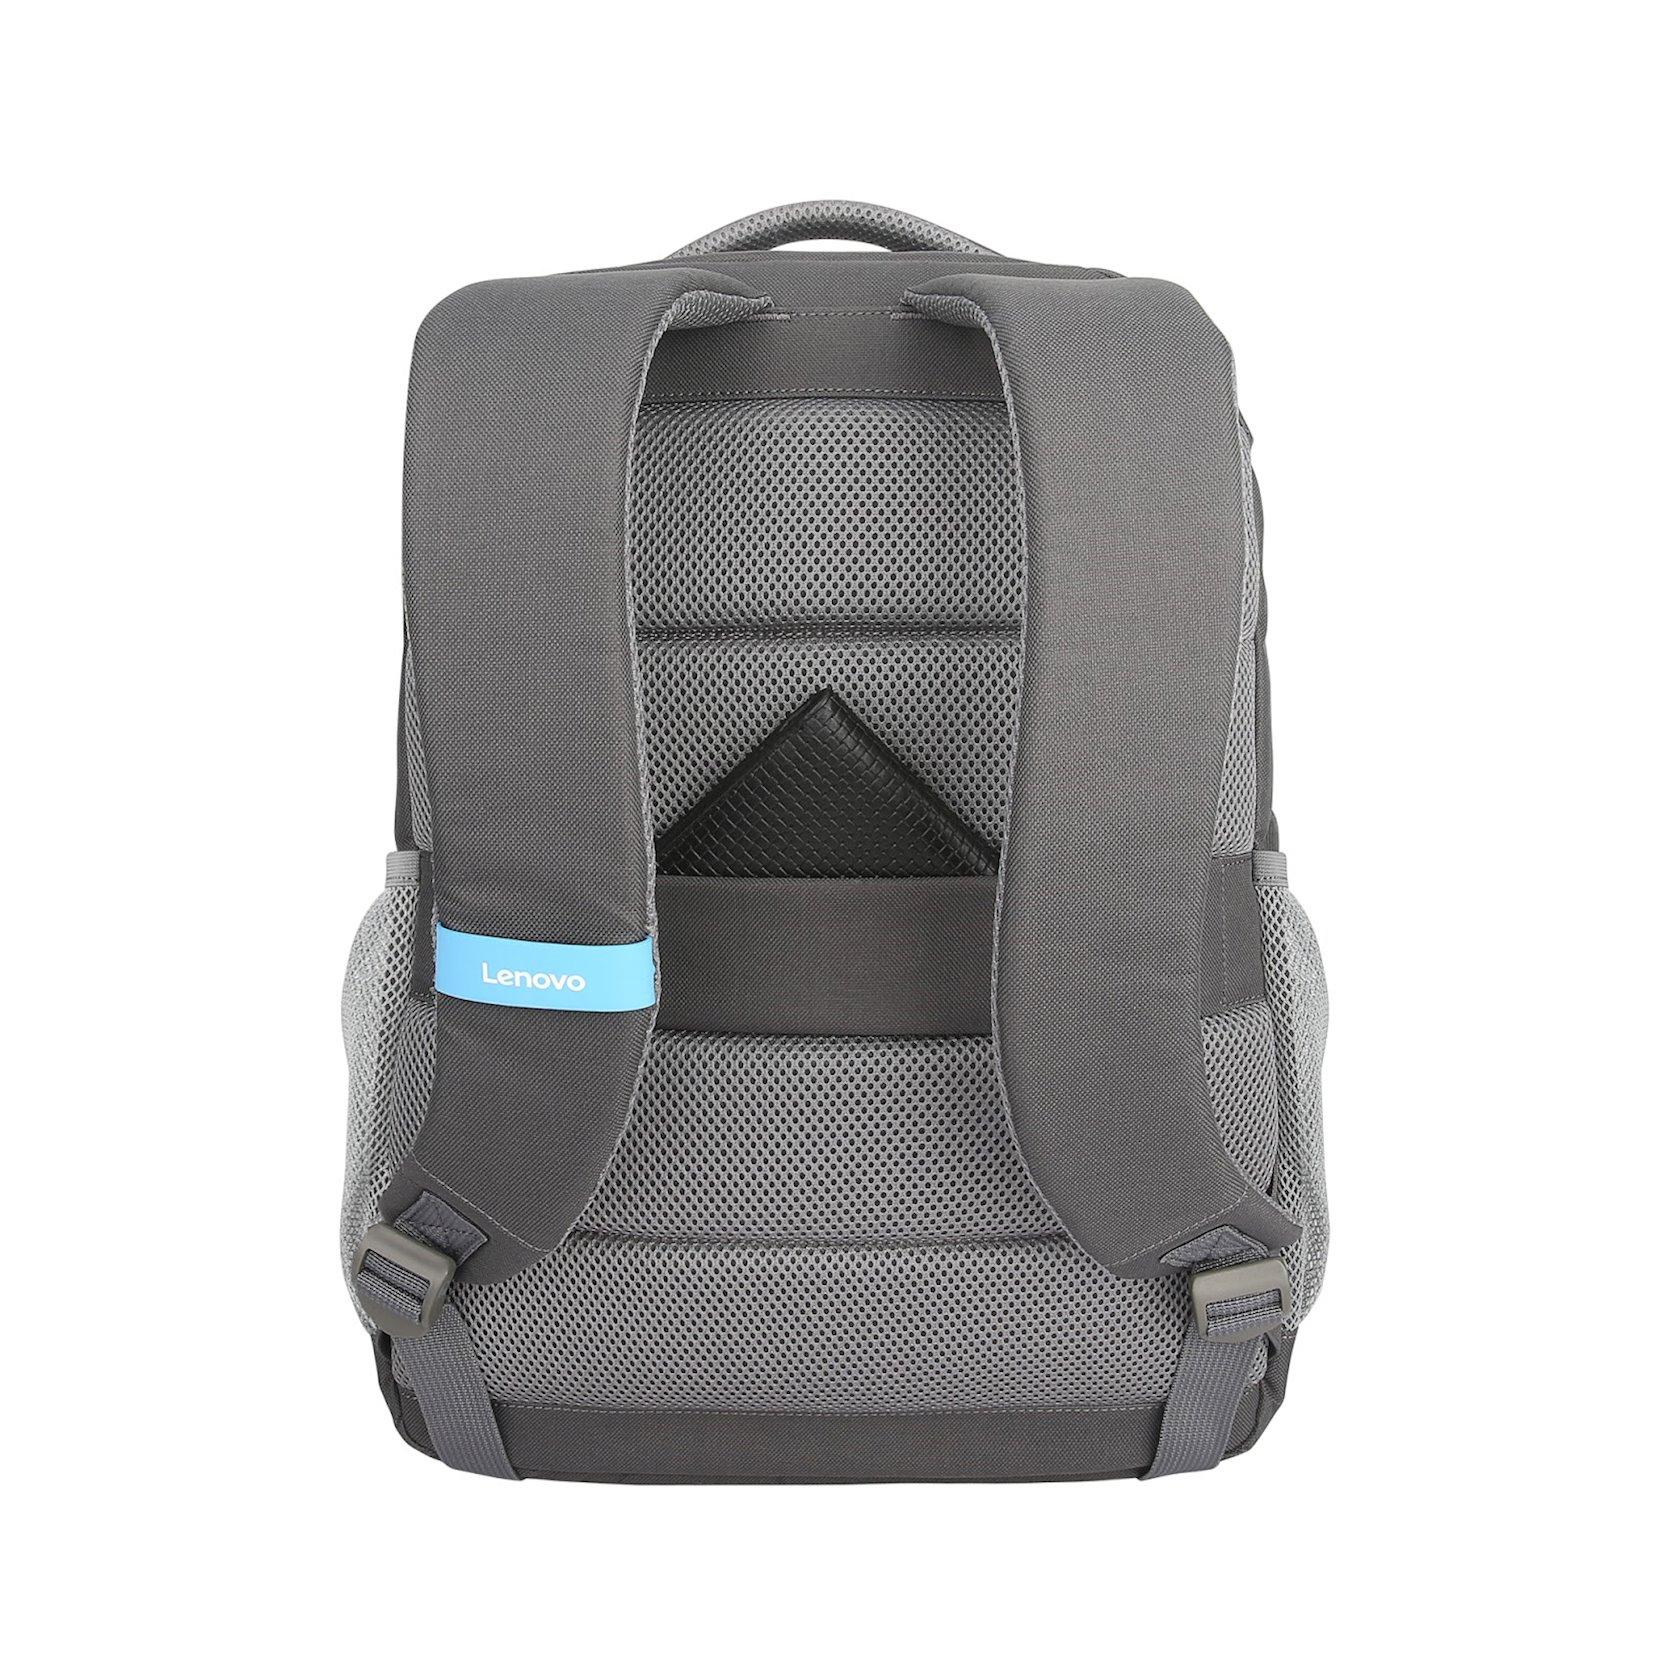 "Noutbuk üçün bel çantası Lenovo Laptop Everyday Backpack B515 15.6"" Grey"